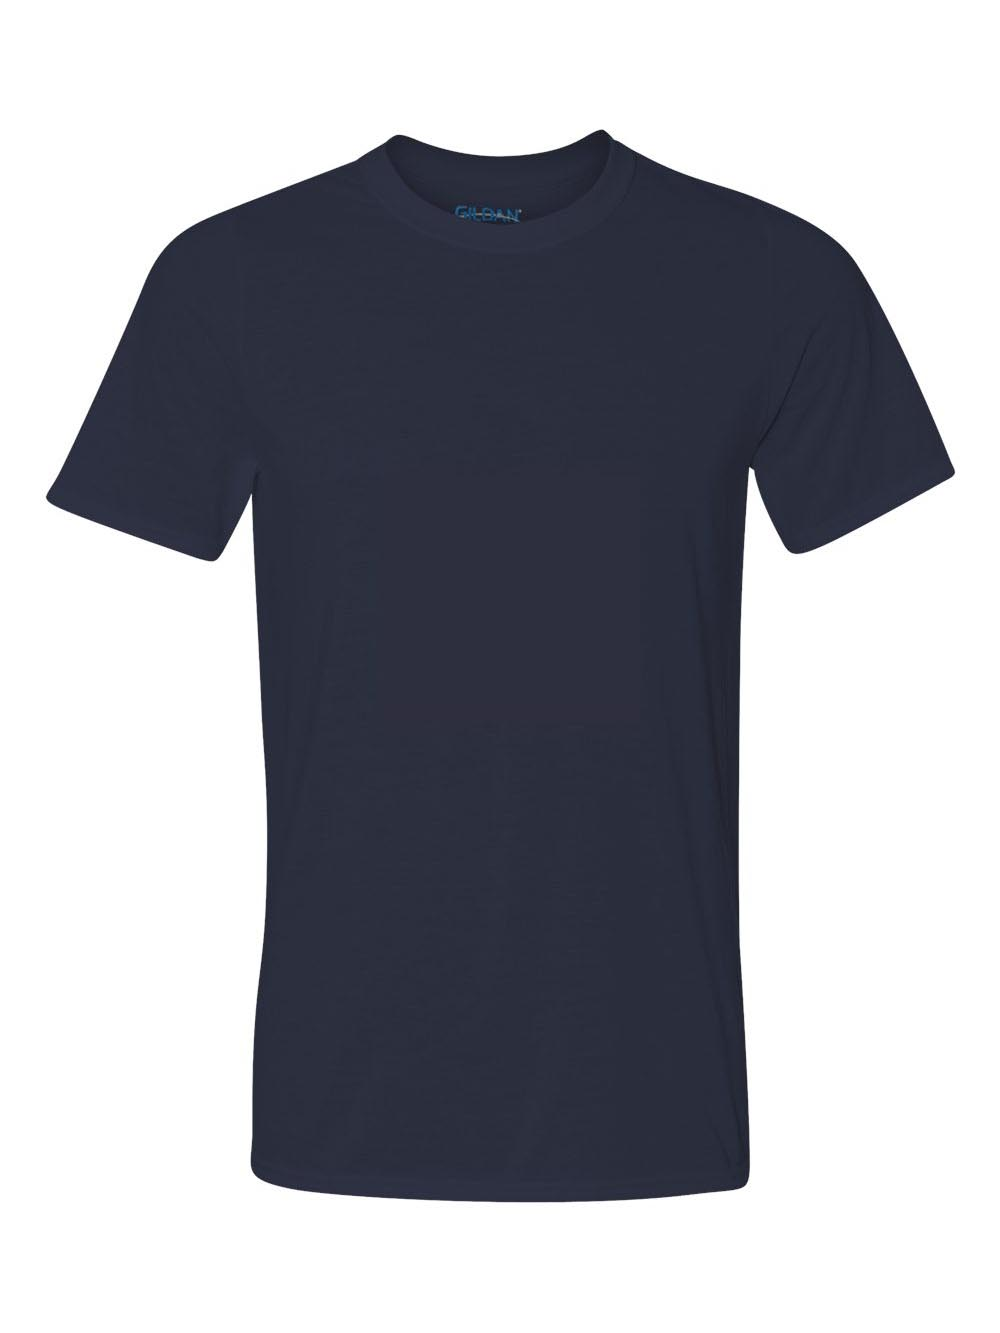 Gildan - Performance Short Sleeve T-Shirt - 42000